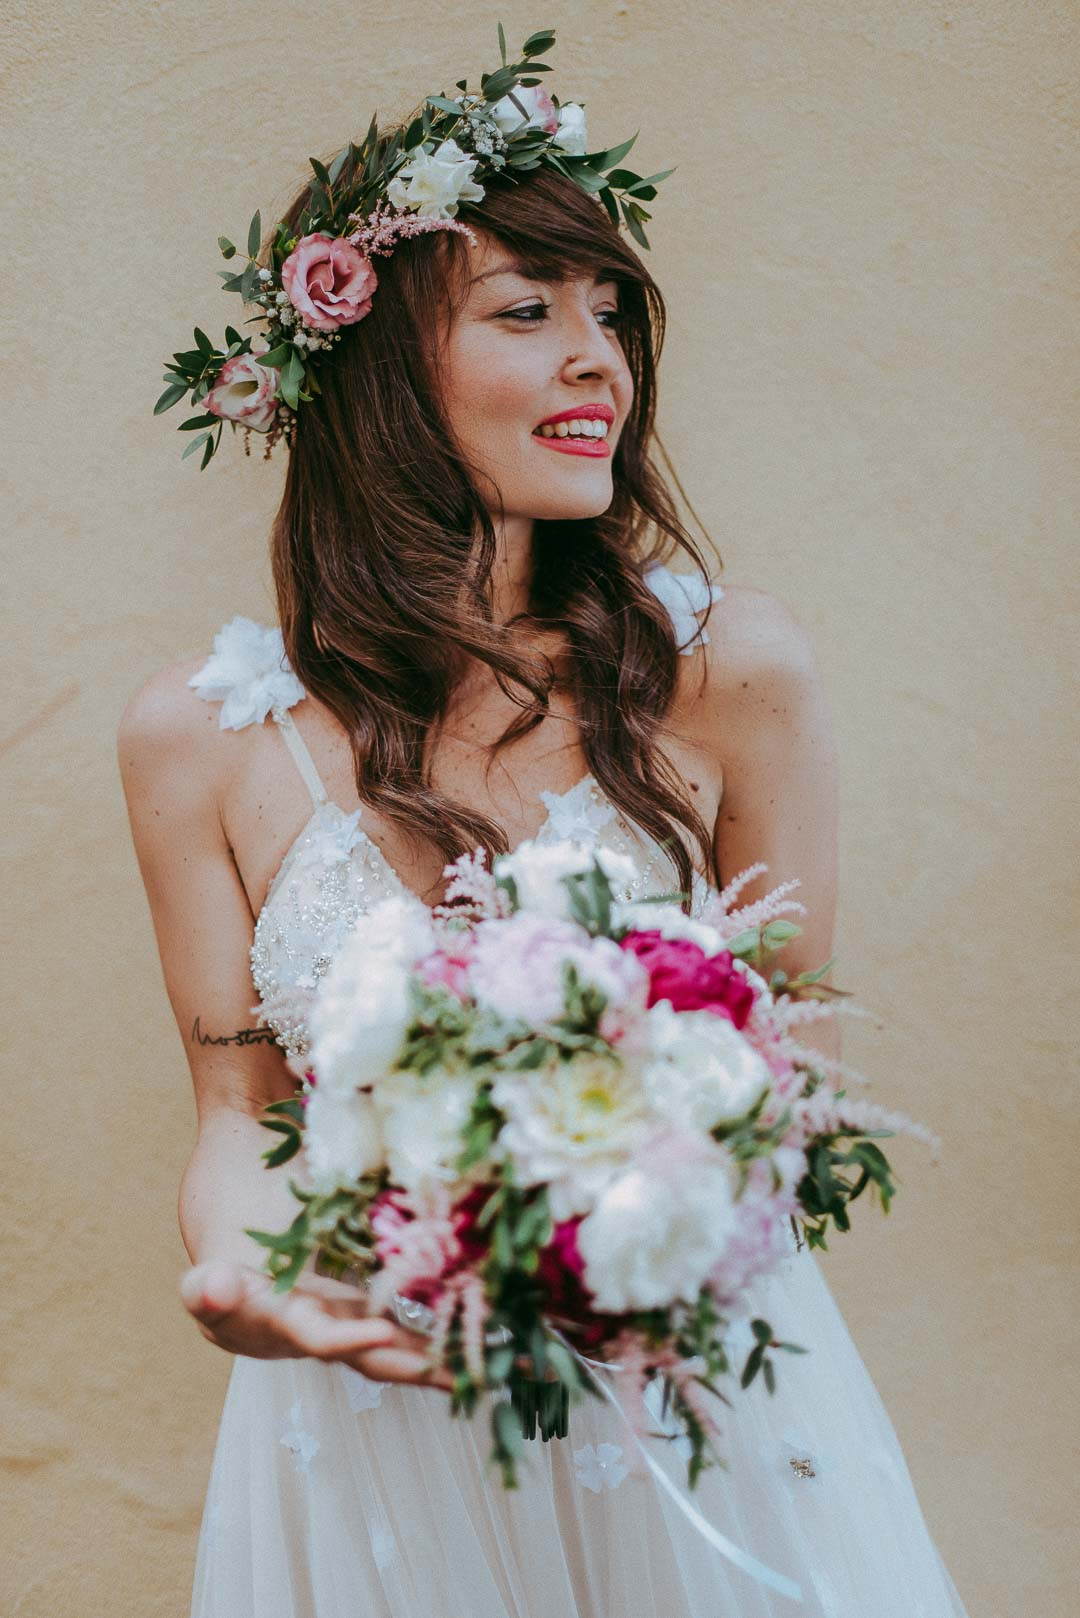 wedding-photographer-destination-fineart-bespoke-reportage-amalficoast-torrelacerniola-vivianeizzo-spazio46-50